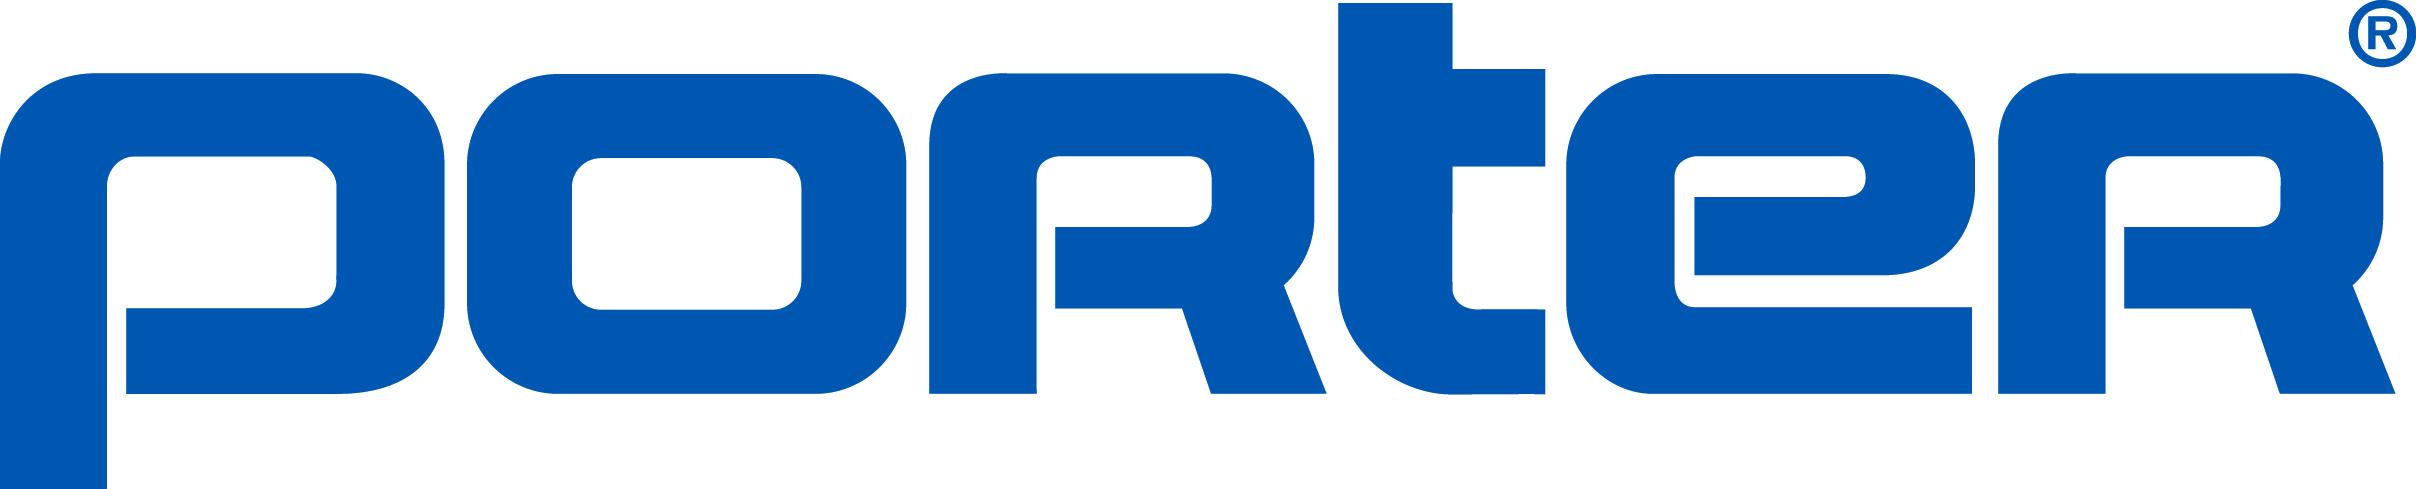 Porter Athletics Receives Greenguard Certification